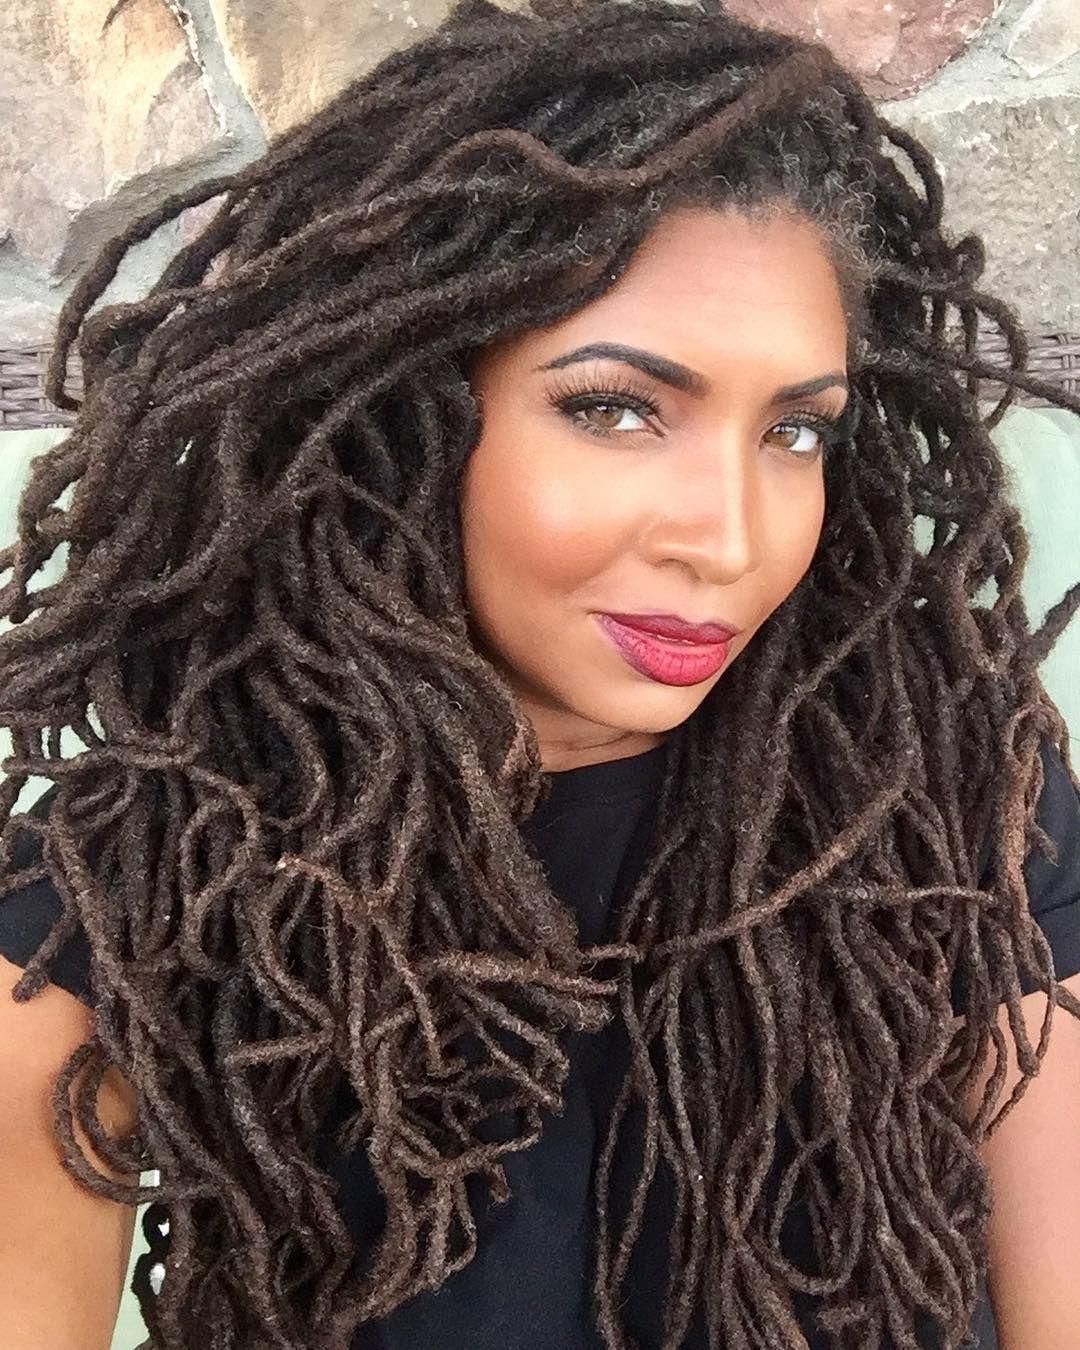 Afro Hairstyles hairstyleforblackwomen.net 12